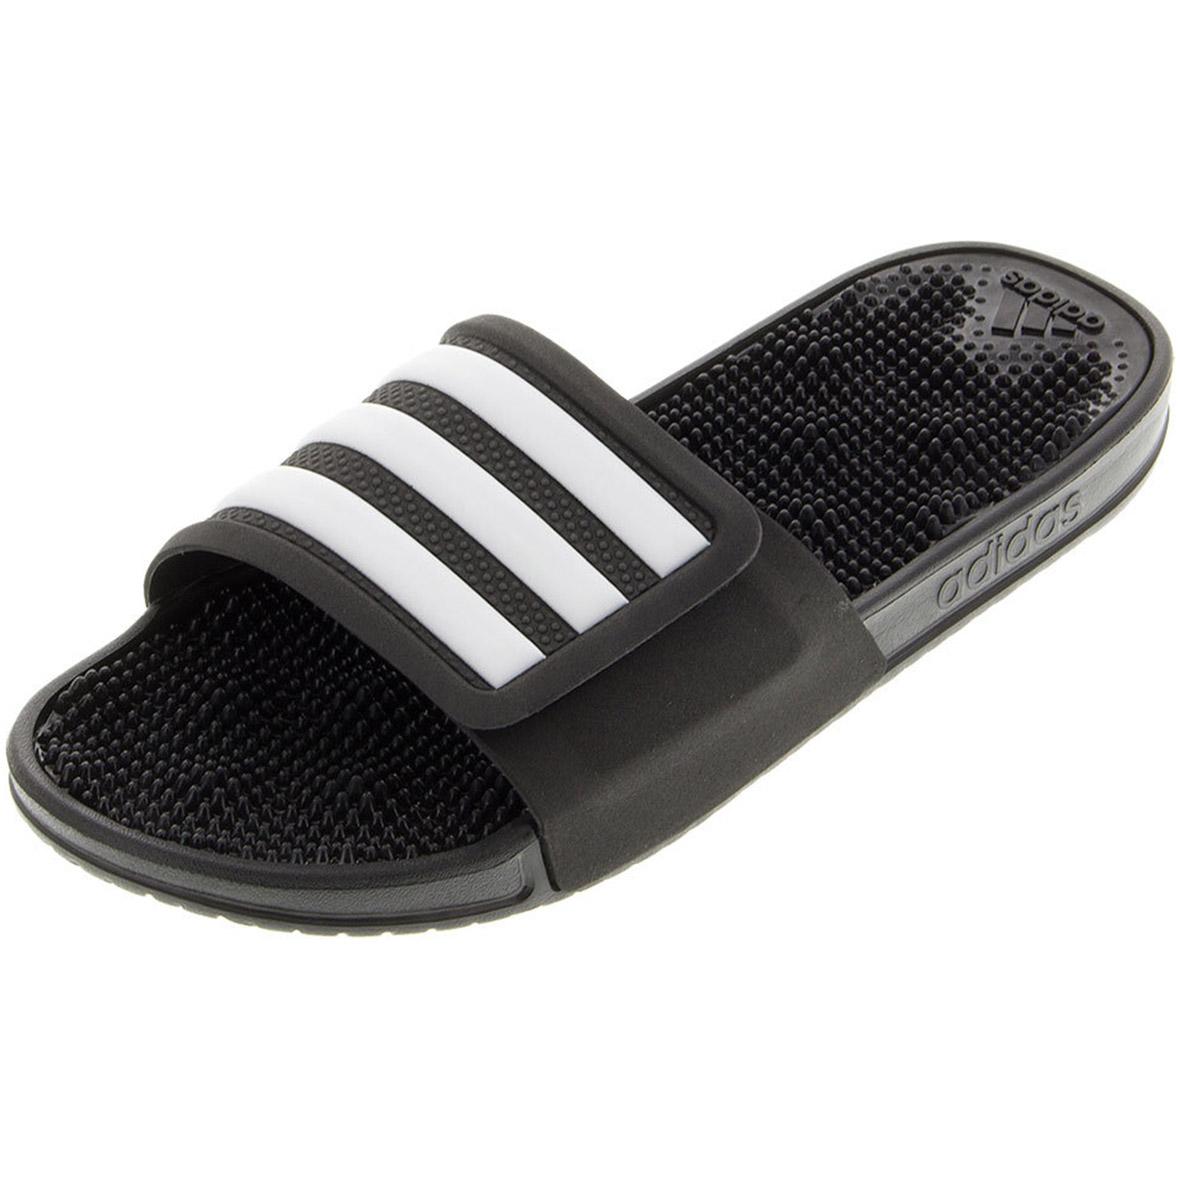 b94d7da377b adidas Men s Adissage 2.0 Slides Sandal - SportingLife Blog